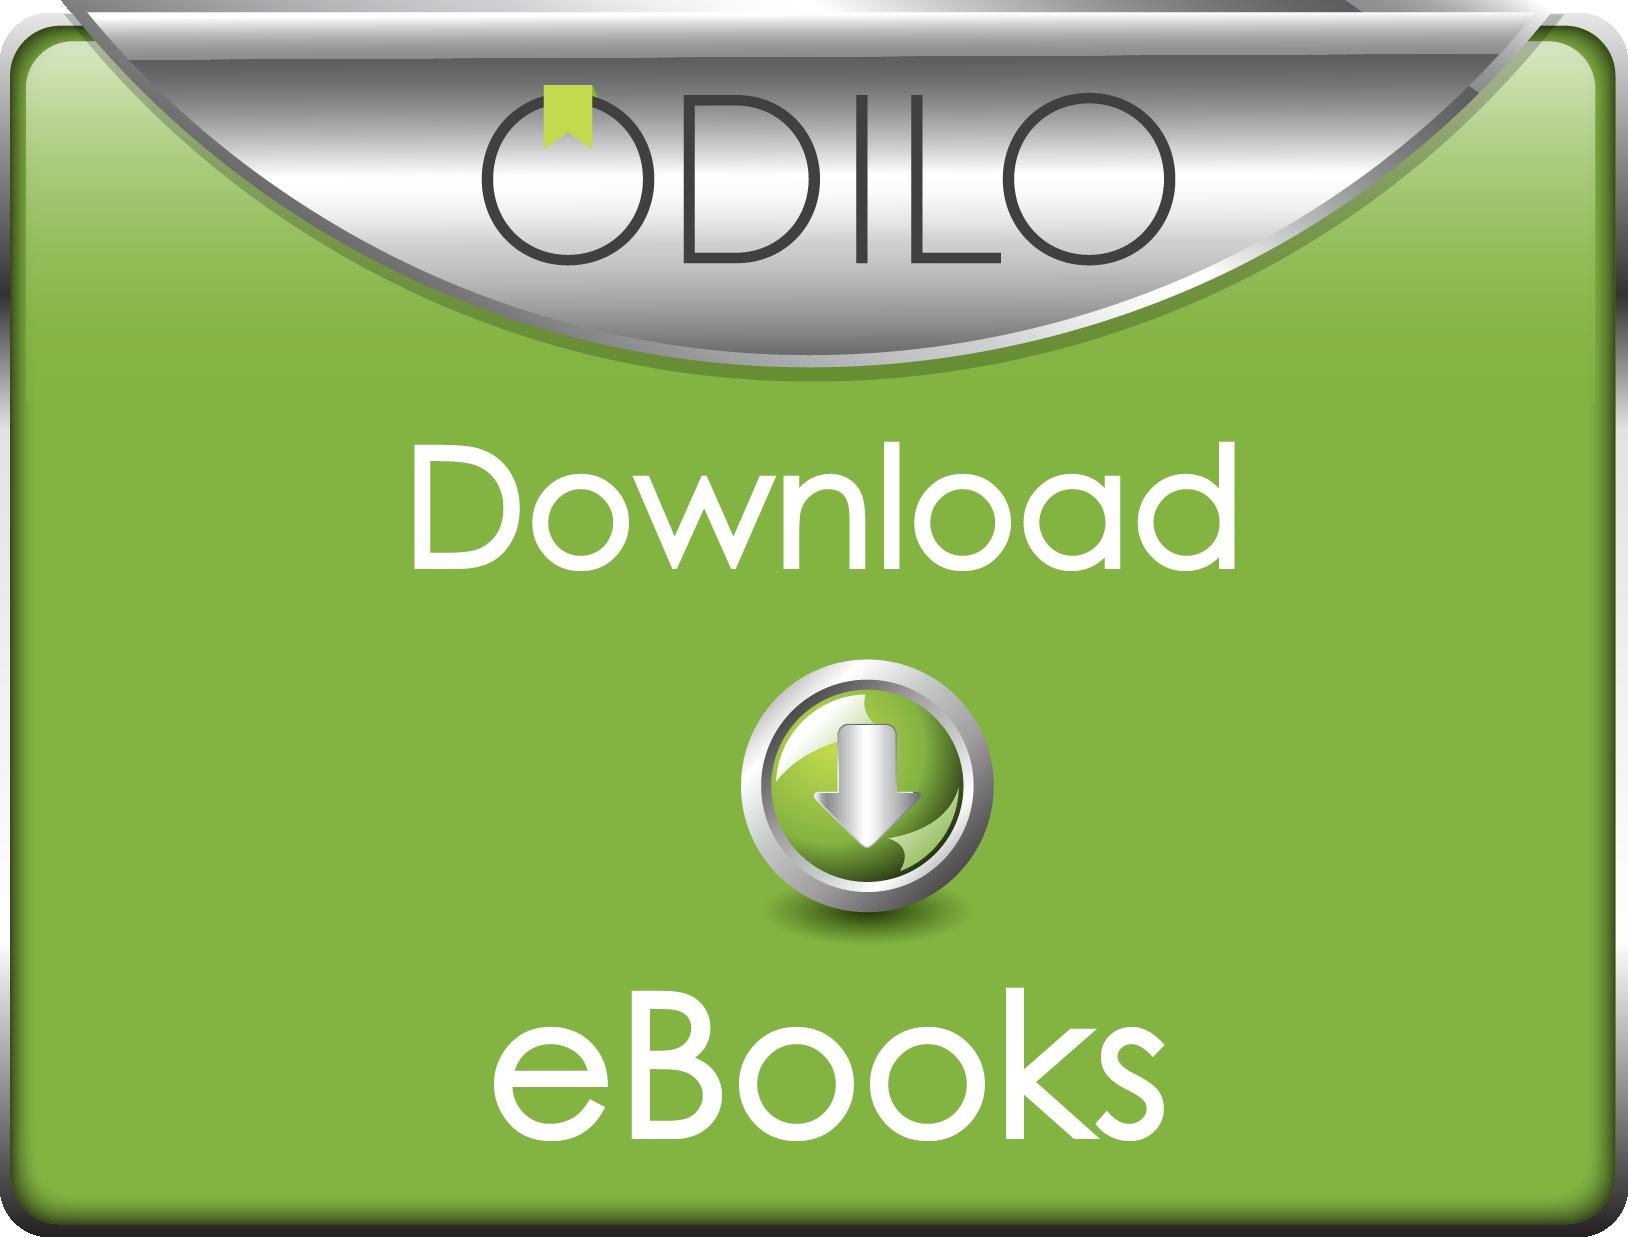 Download eBooks from Odilo Download books, Ebooks